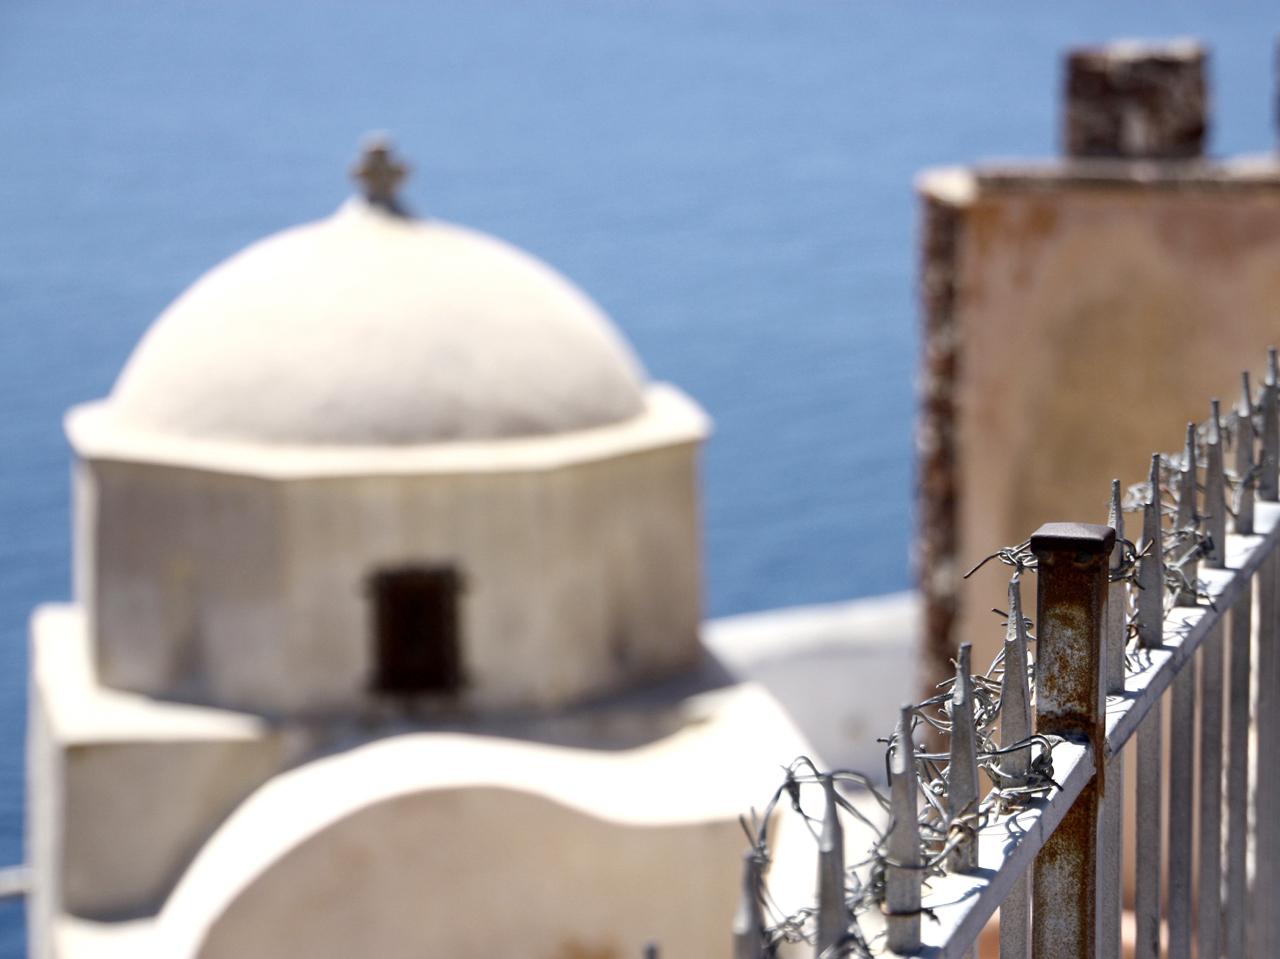 One Day Tour to Amazing Santorini Island from Heraklion, heraklion ferry boat trip santorini, visit santorini from crete, heraklion to santorini ferry tickets, heraklion santorini best excursion to book, best island to visit from crete